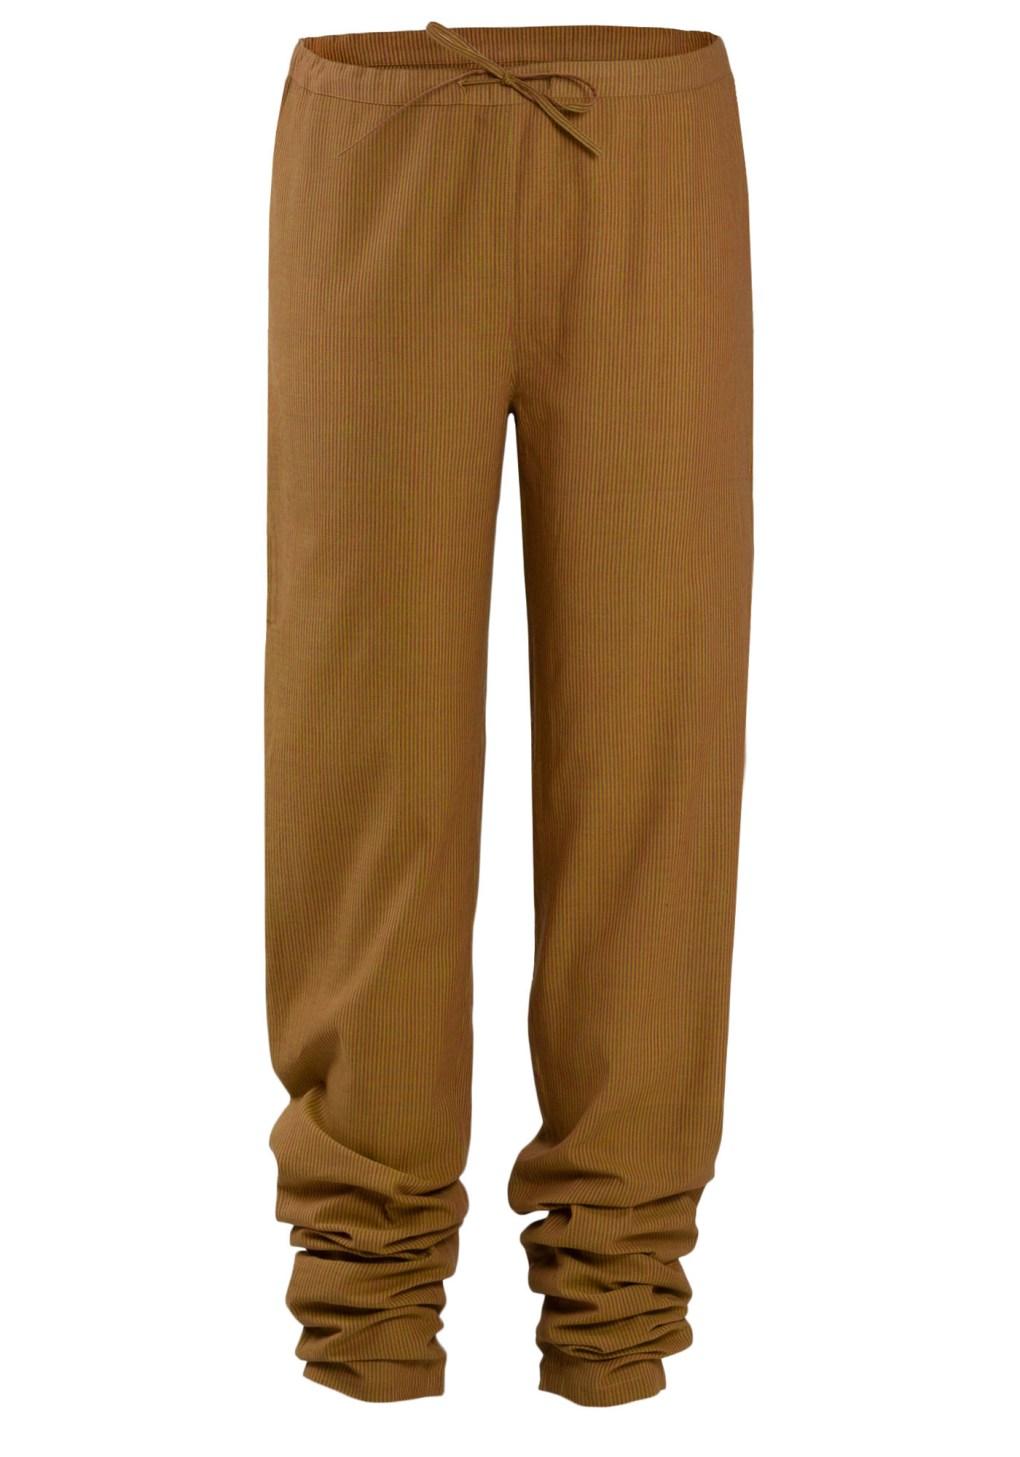 MINC Yellow & Red Striped Handloom Cotton Drawstring Pants